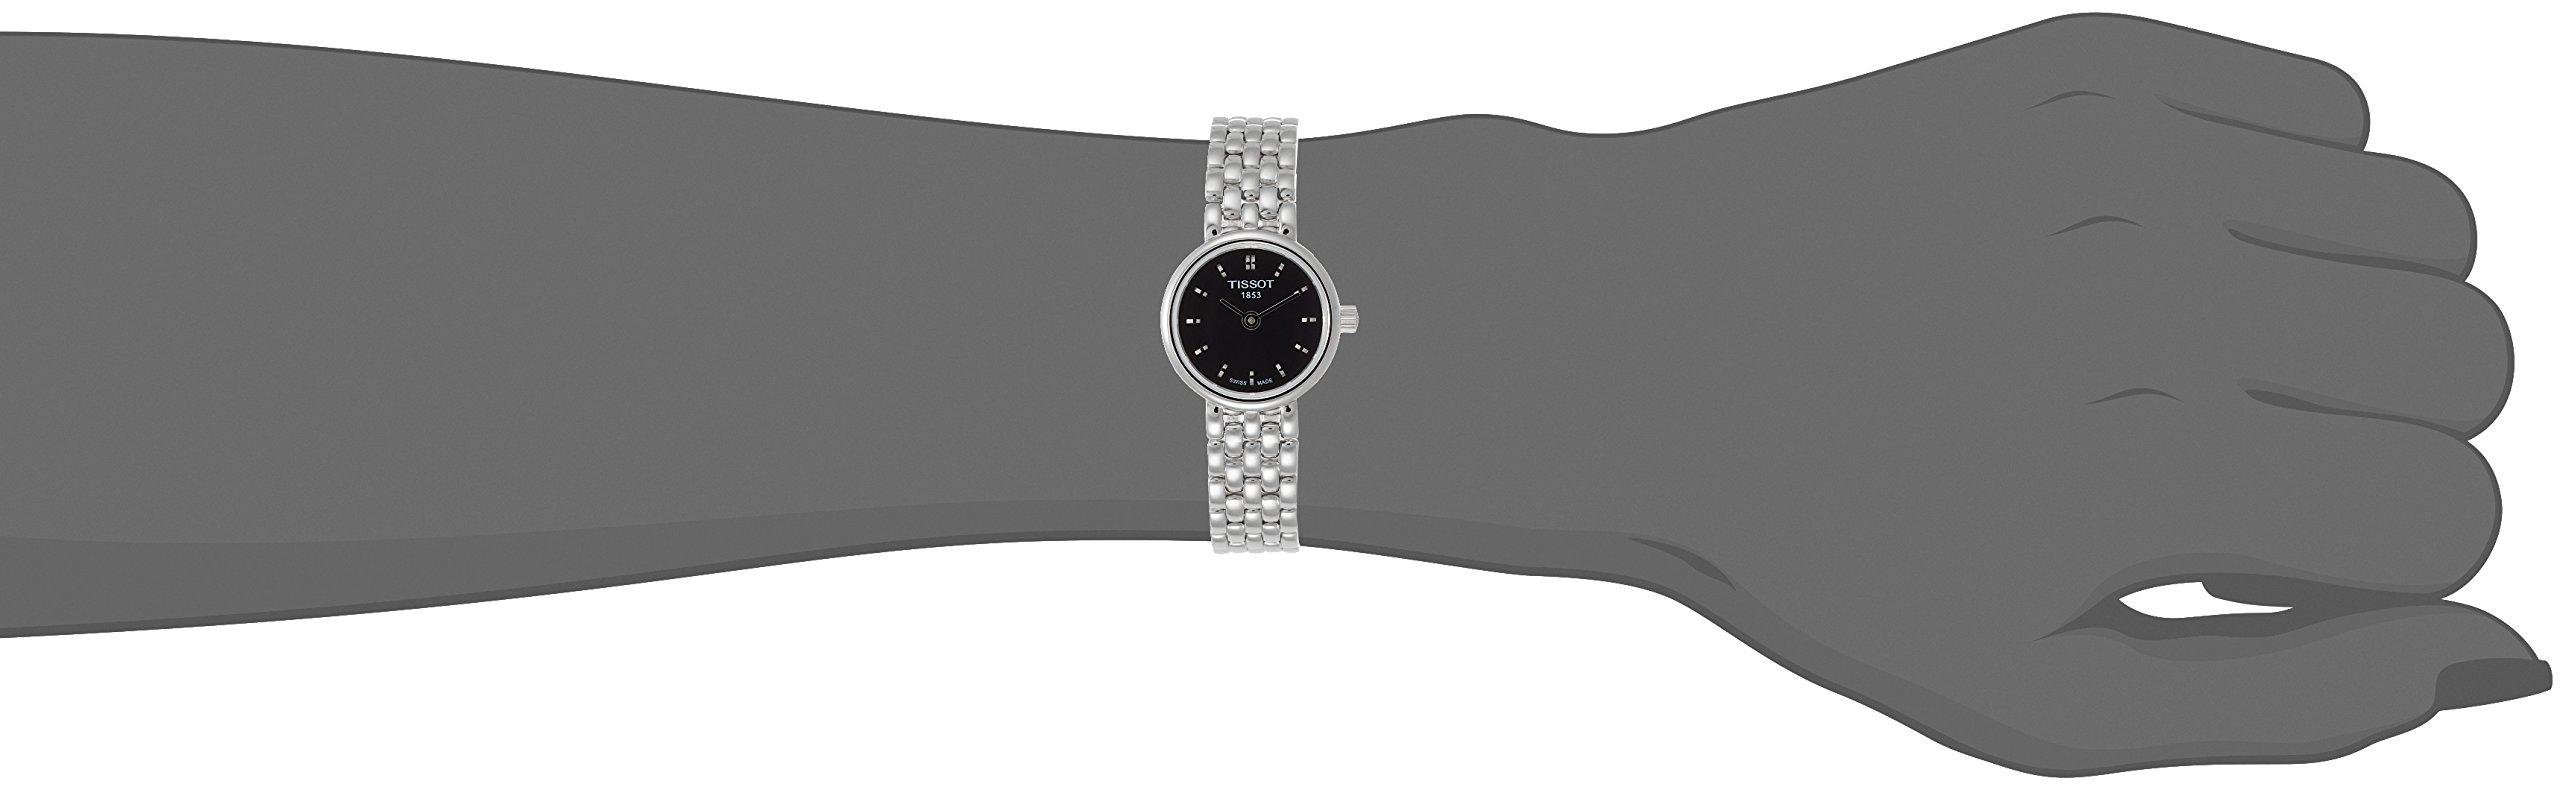 Tissot Lovely T0580091105100 – Reloj de Mujer de Cuarzo, Correa de